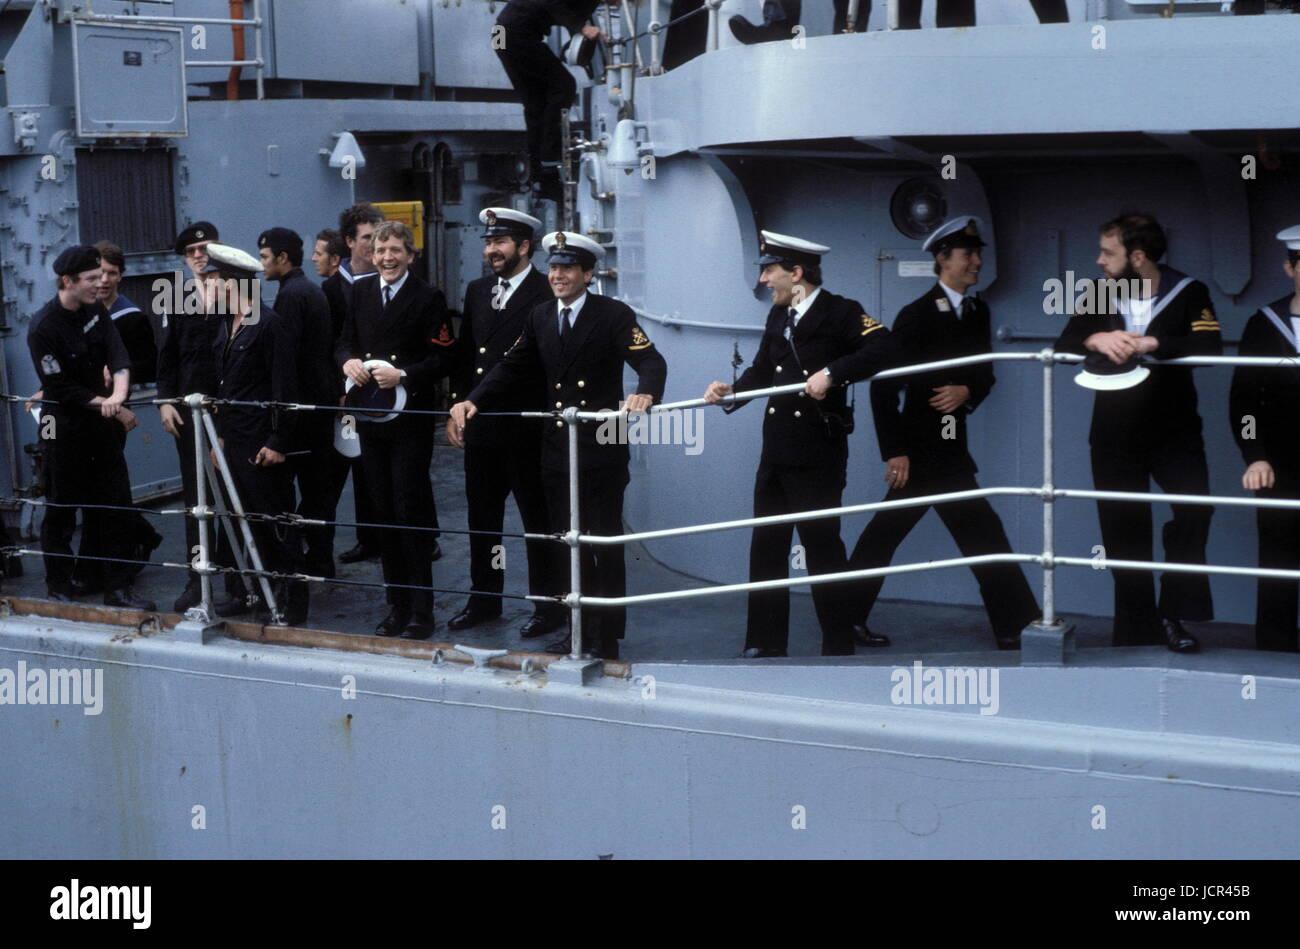 AJAXNETPHOTO. 19TH JUNE. 1982. PORTSMOUTH, ENGLAND. - SURVIVOR RETURNS - CREW OF THE THE BOMB DAMAGED TYPE 42 (1&2) - Stock Image